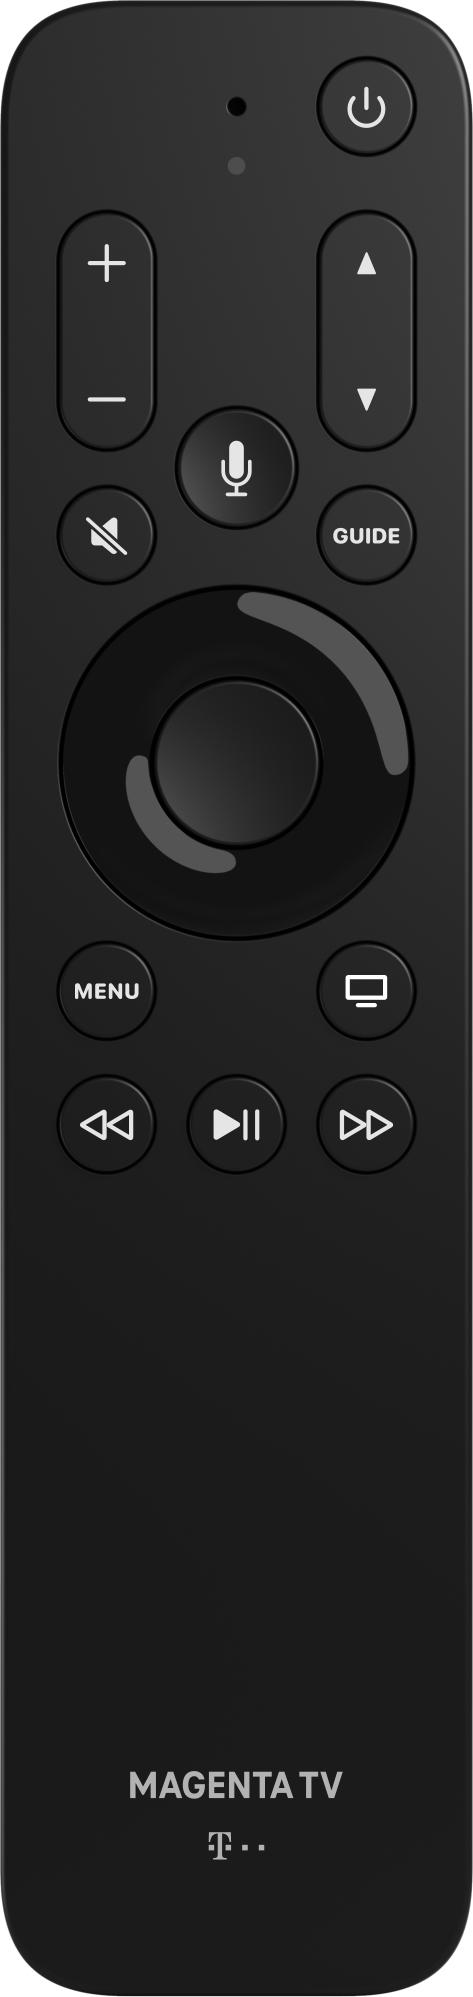 UEI-DT Apple TV 4K remote